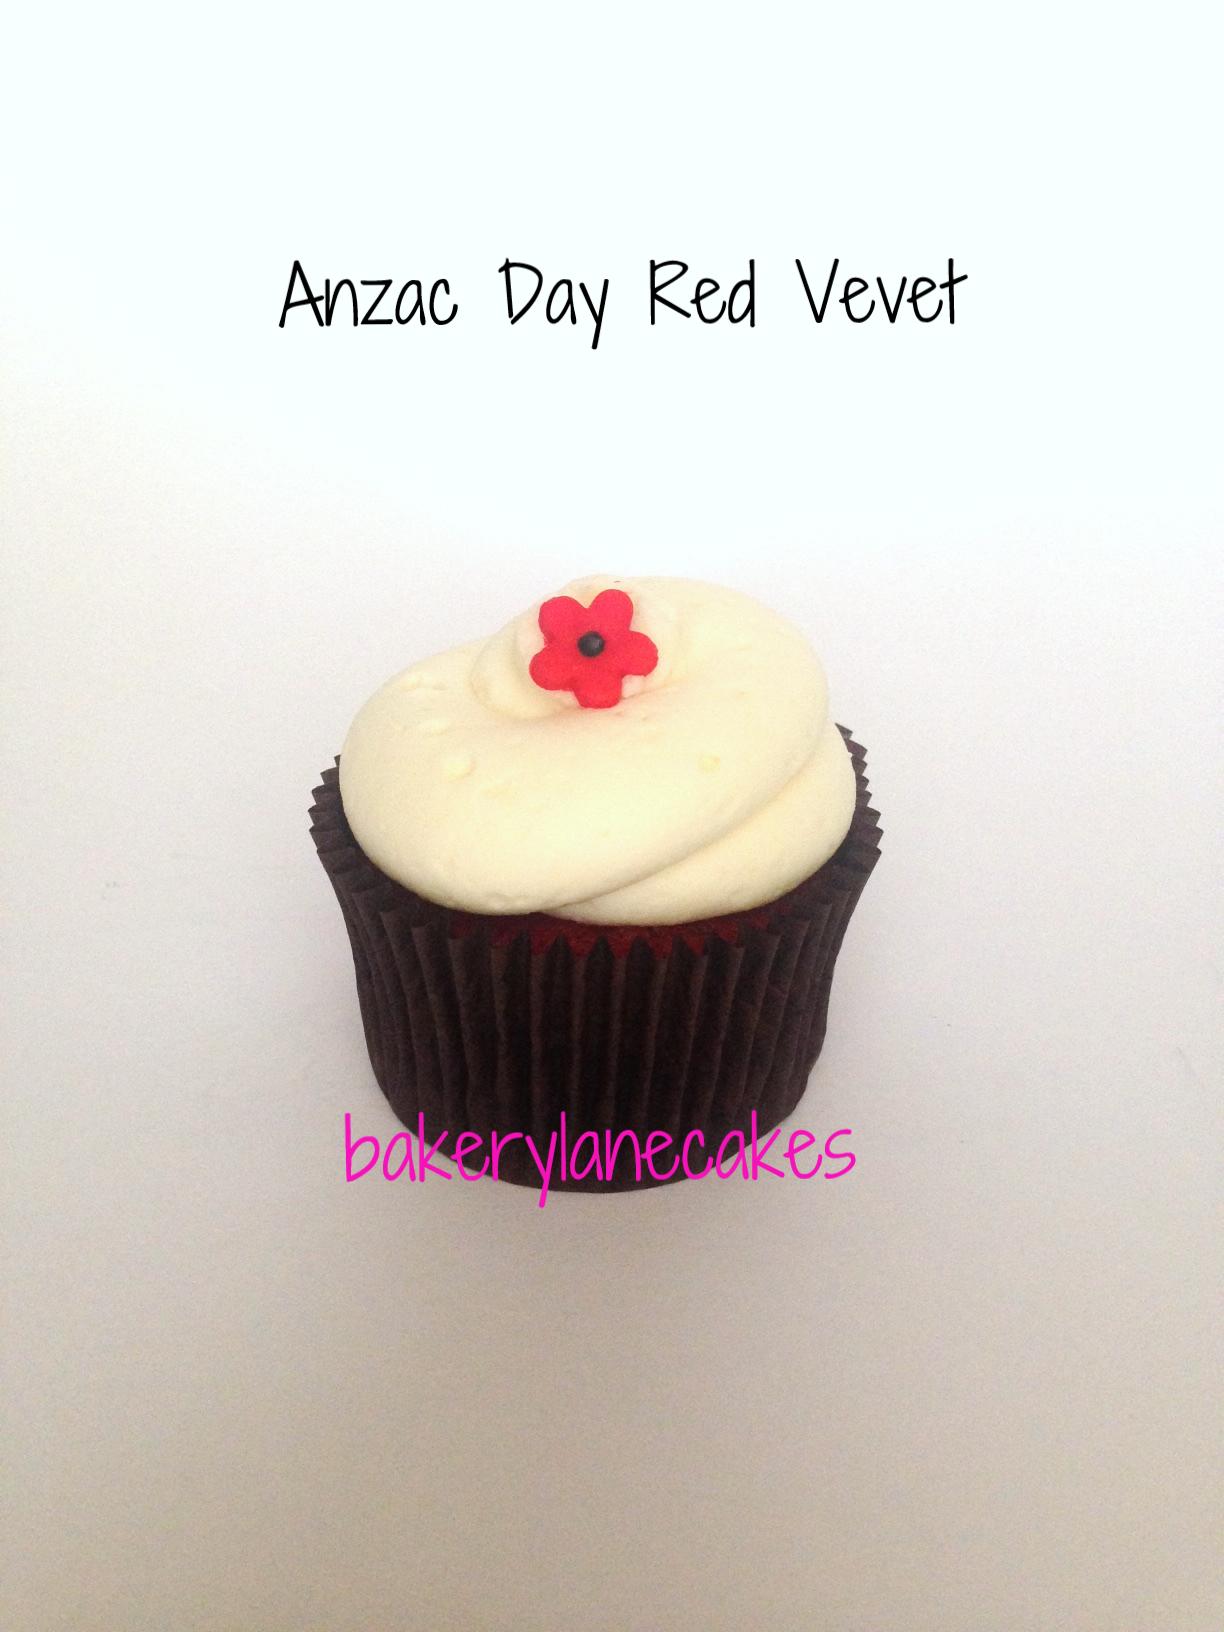 Anzac Day Red Velvet